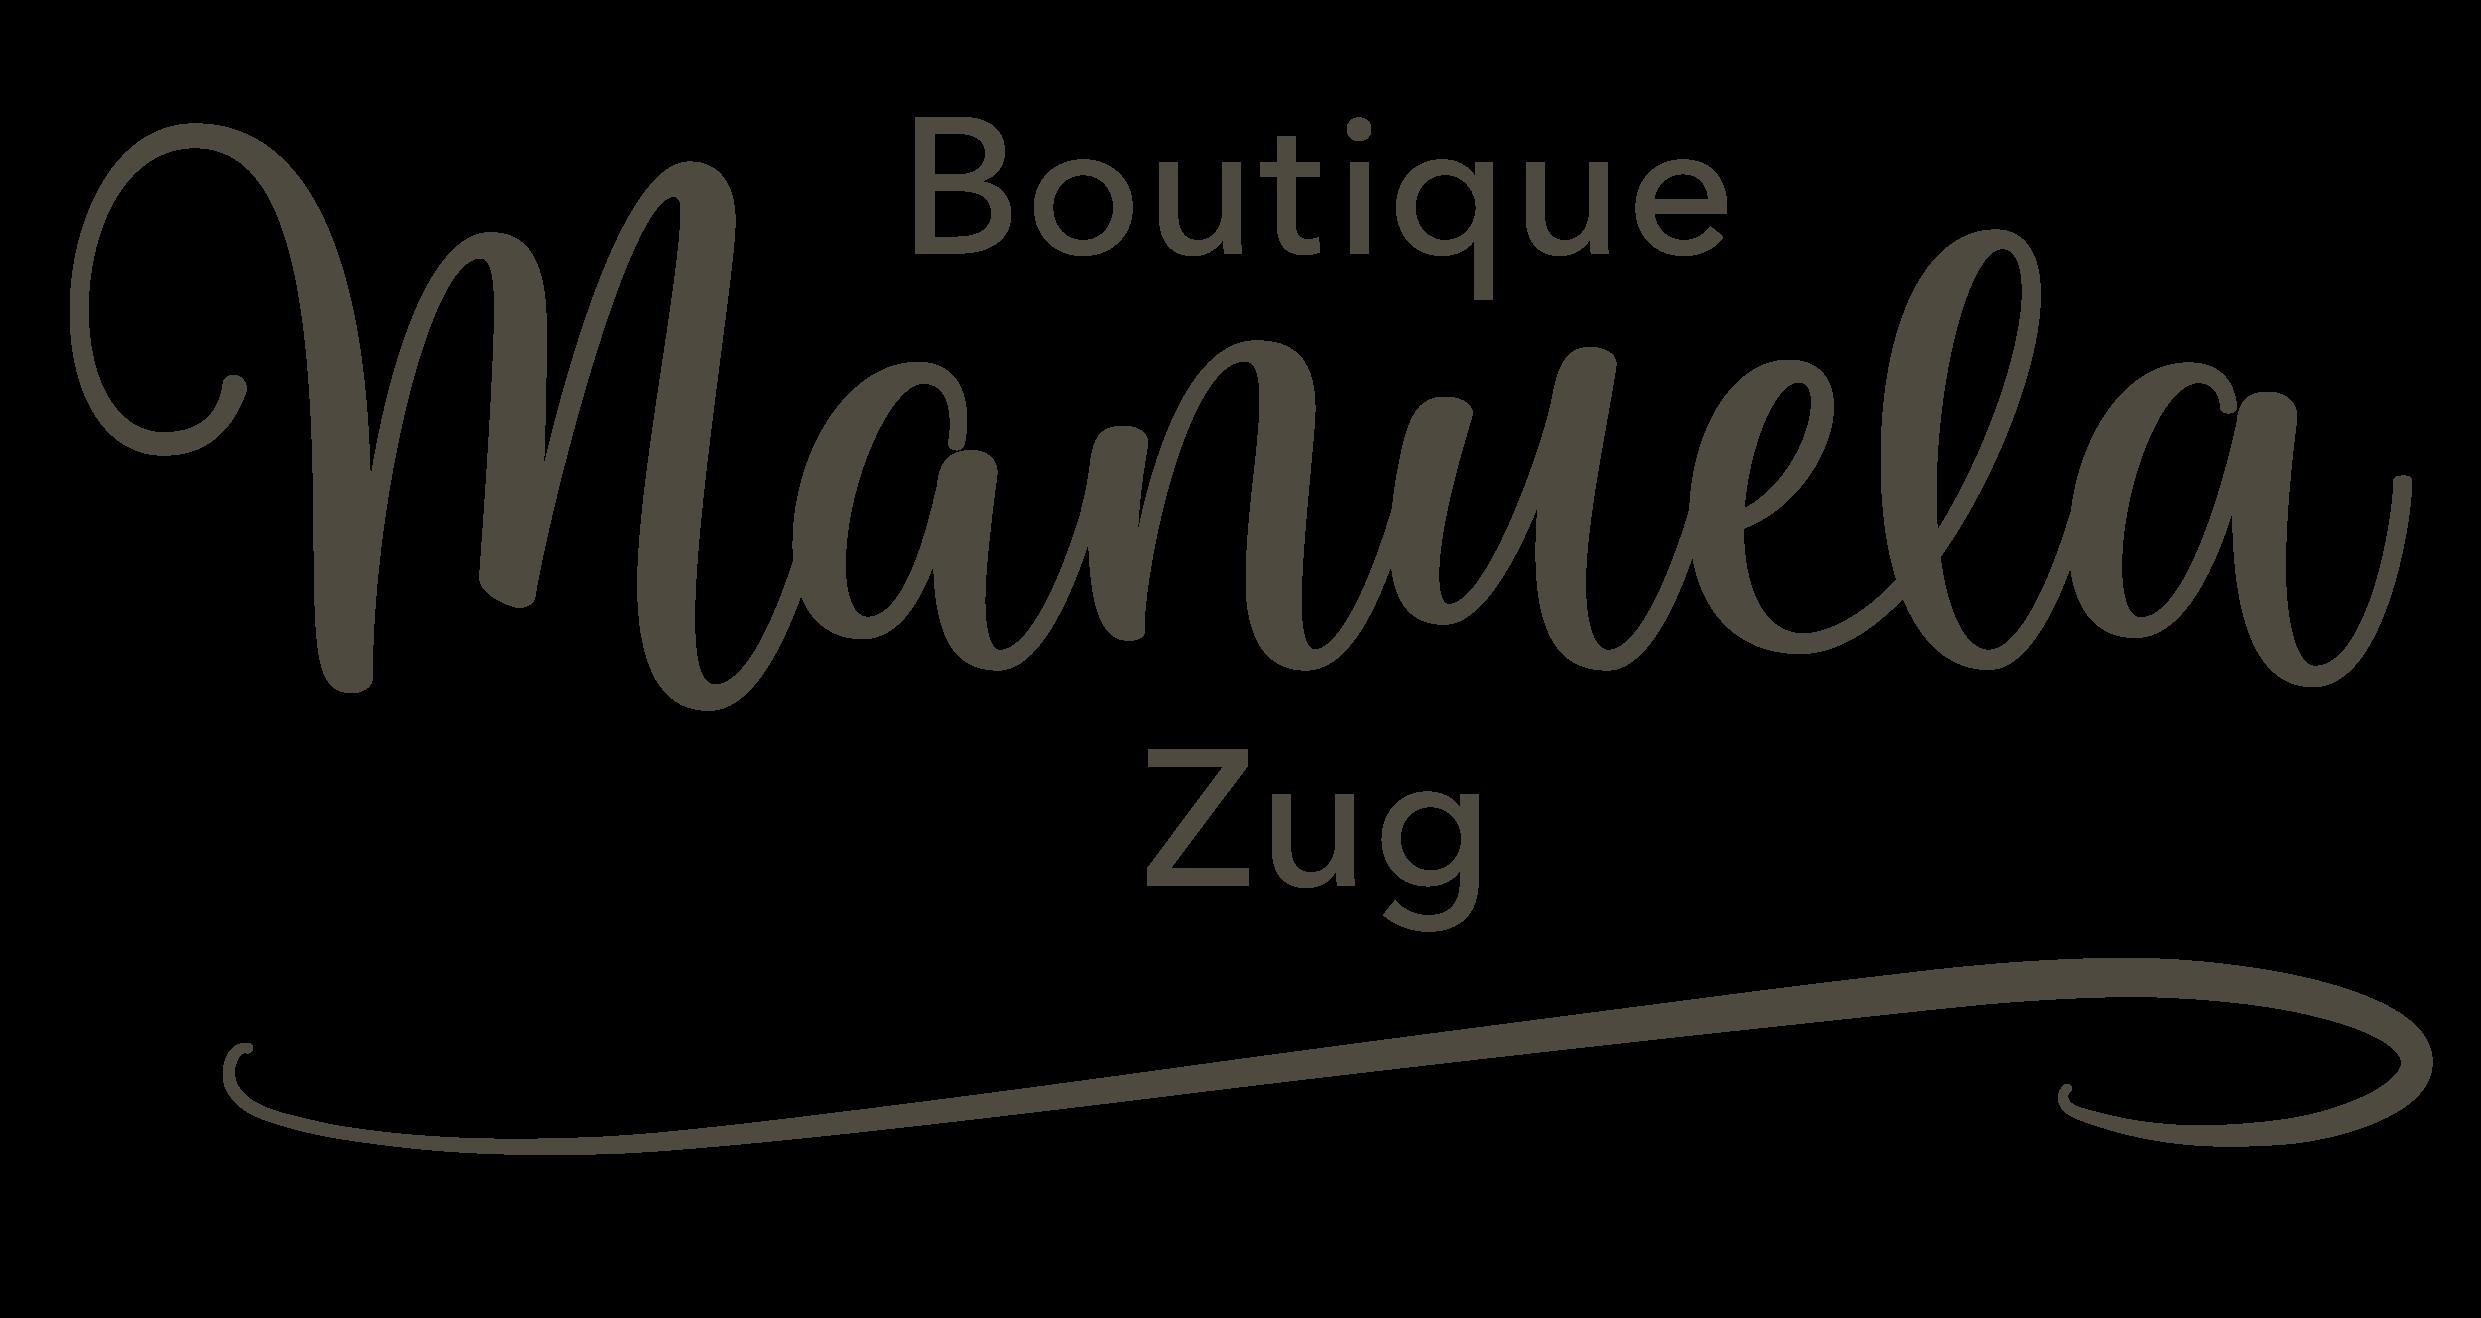 Boutique Manuela Zug